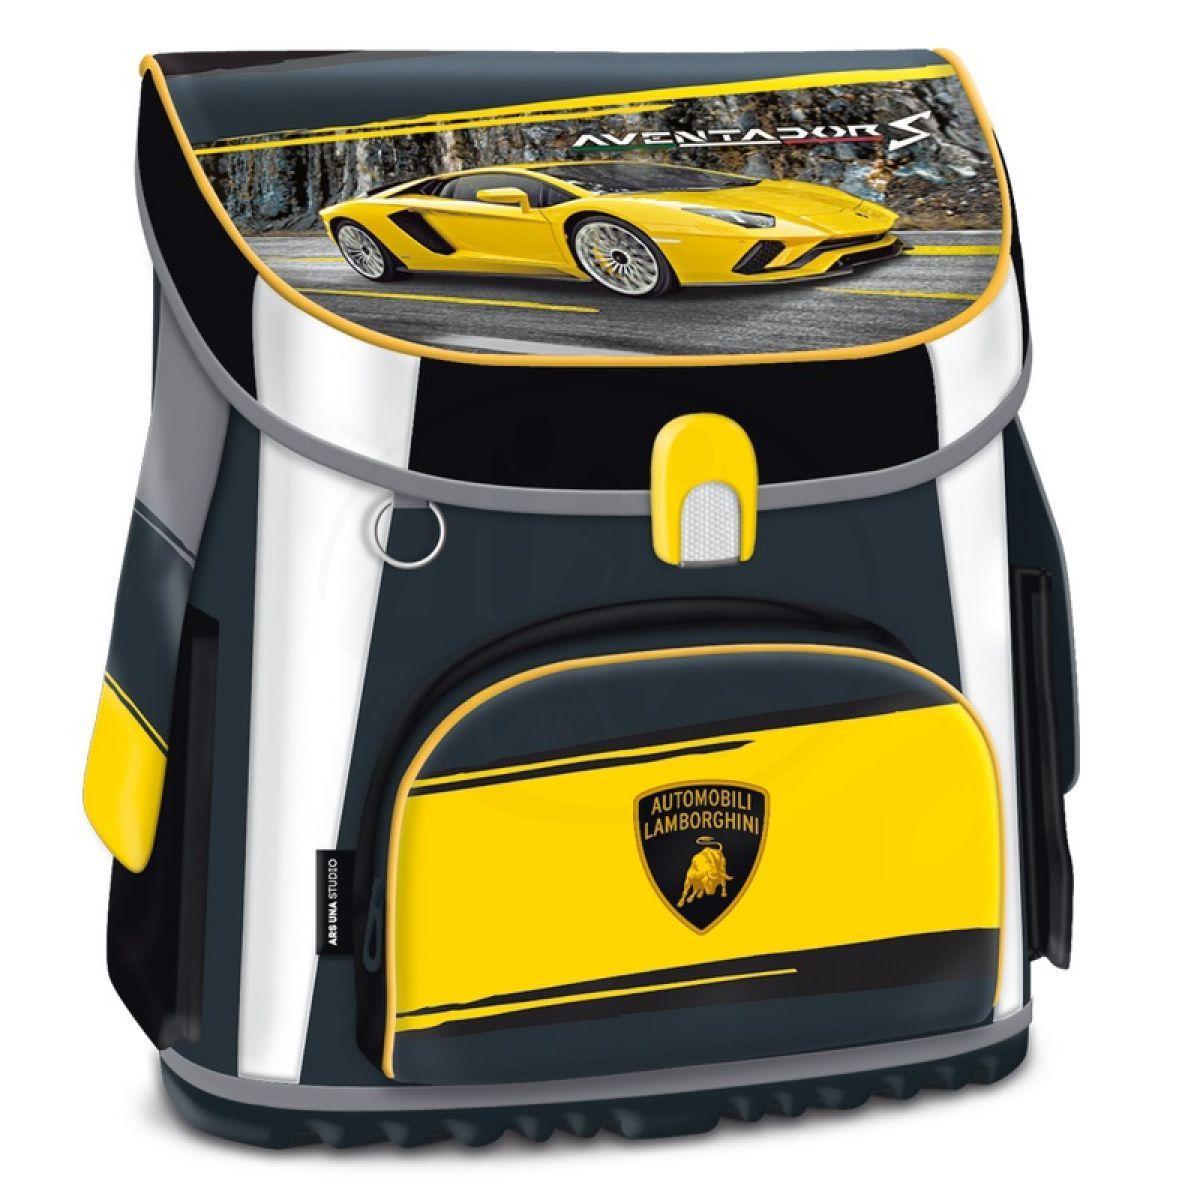 b1798758e1 Ars Una Aktovka Lamborghini 18 magnetic